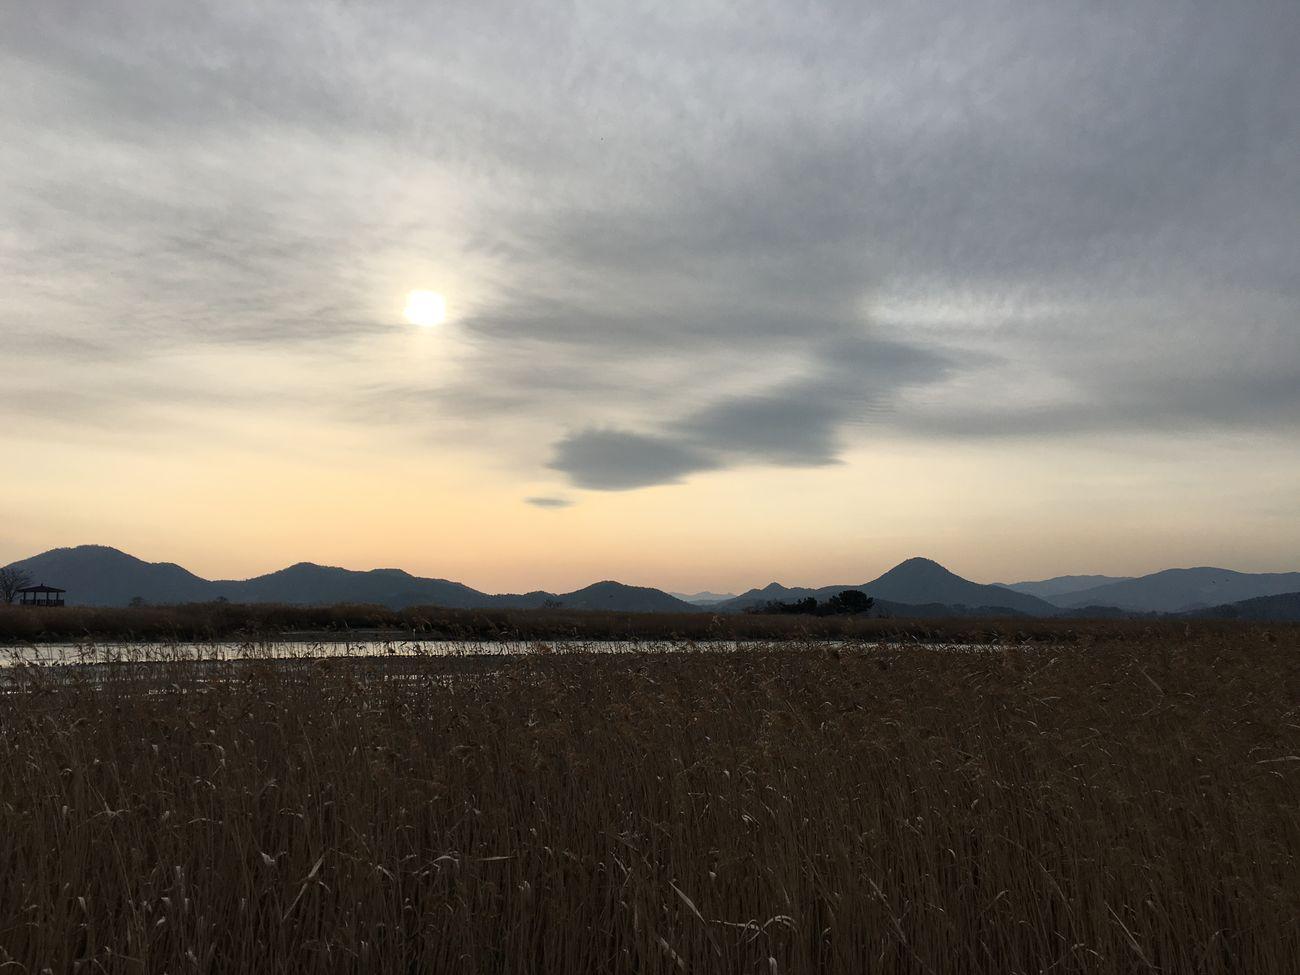 Rail-ro Suncheon Bay Bed Of Reeds South Korea Winter